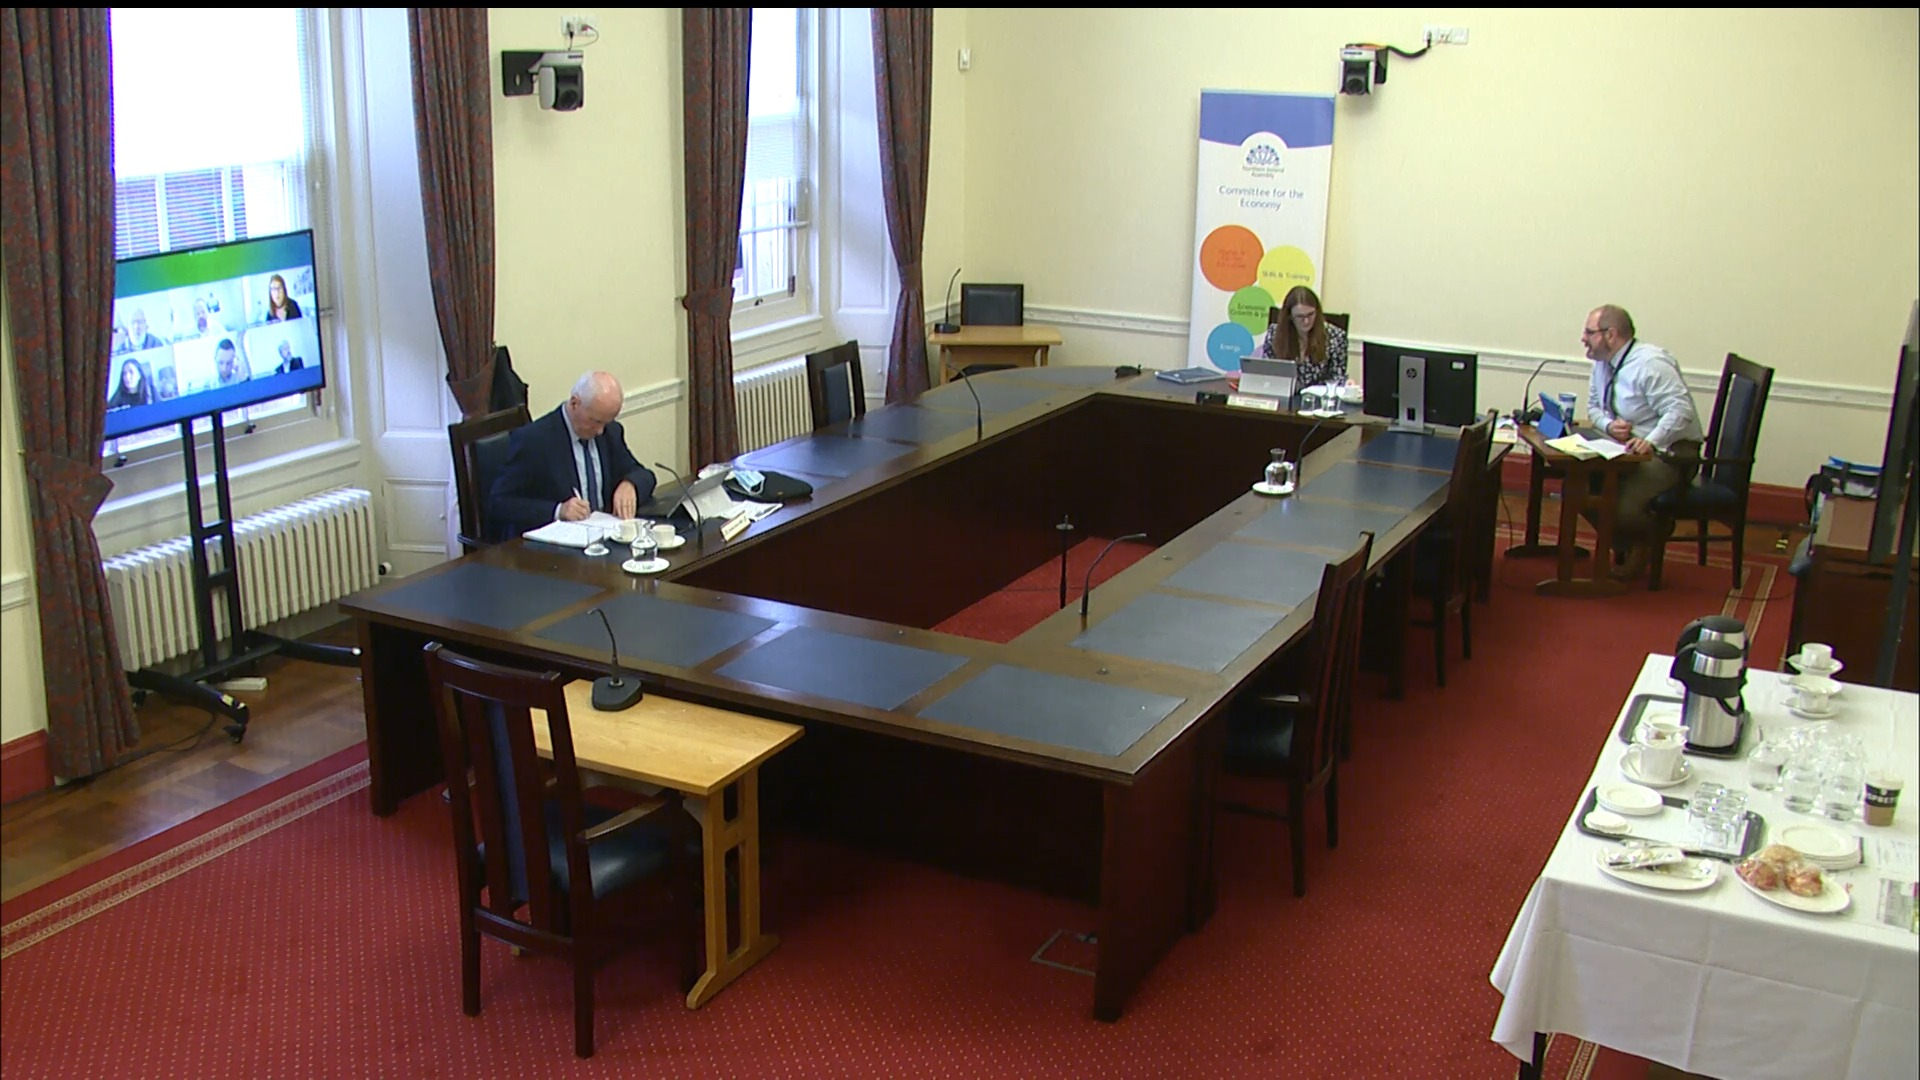 Economy Committee Meeting - Wednesday 27th January 2021